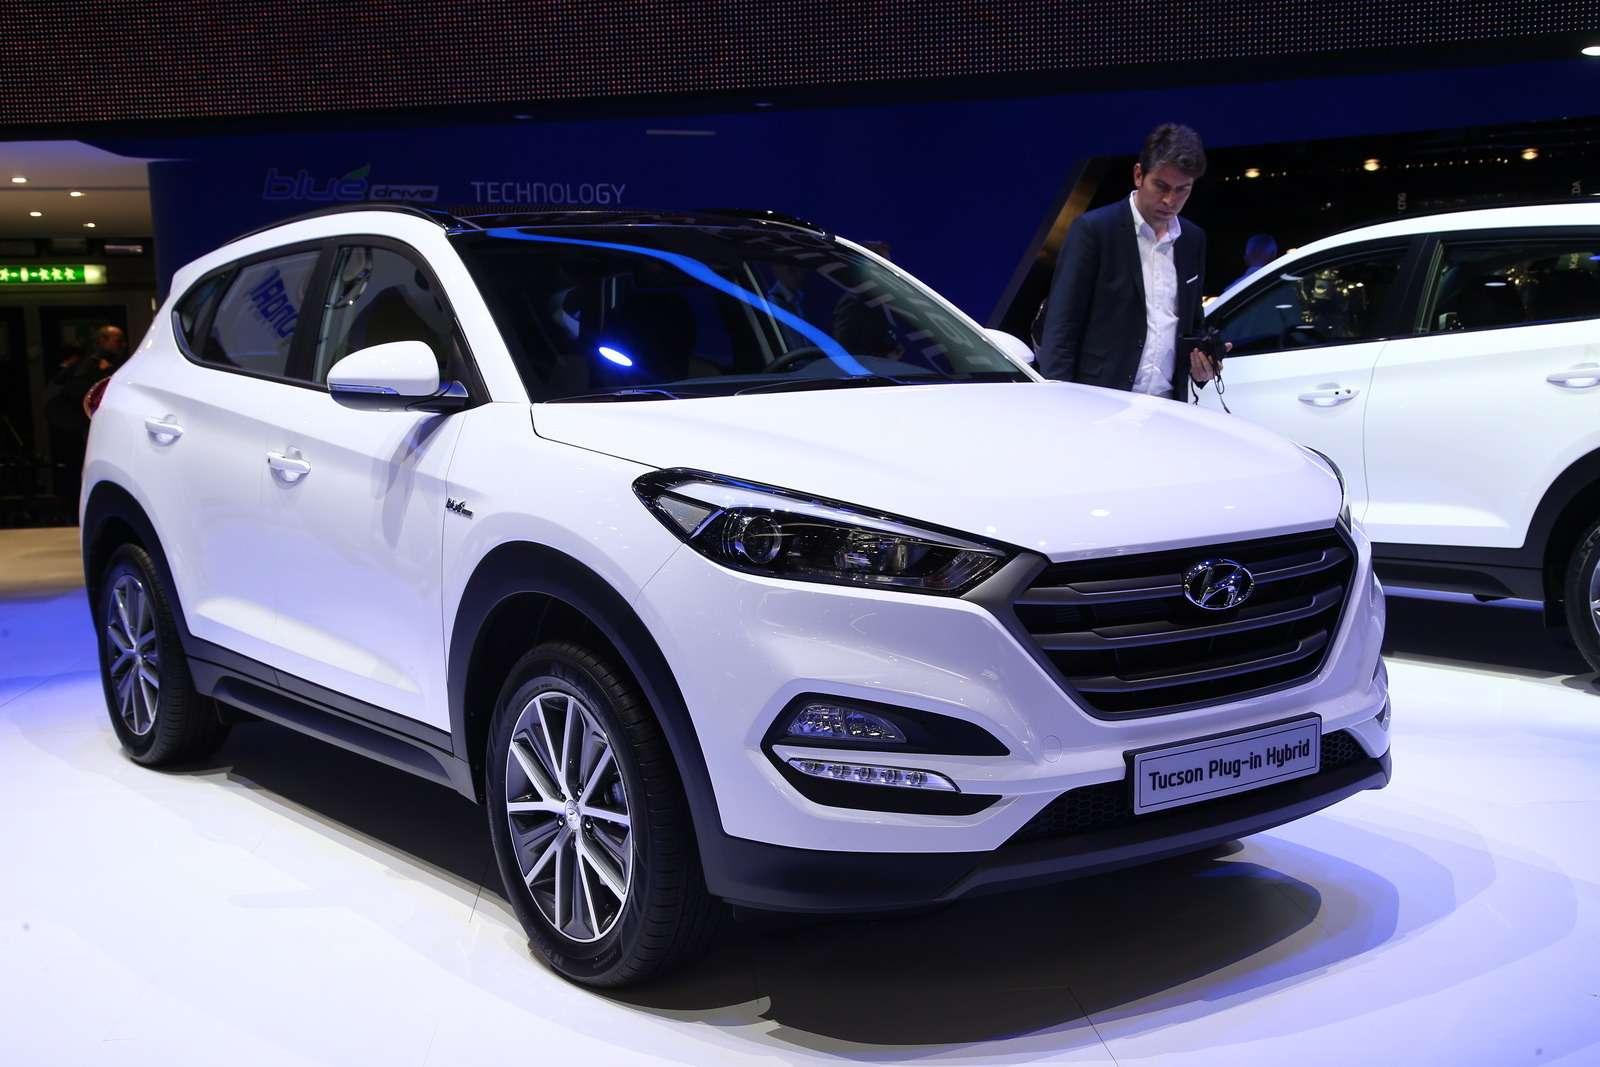 10_Hyundai Tucson (2)_новый размер